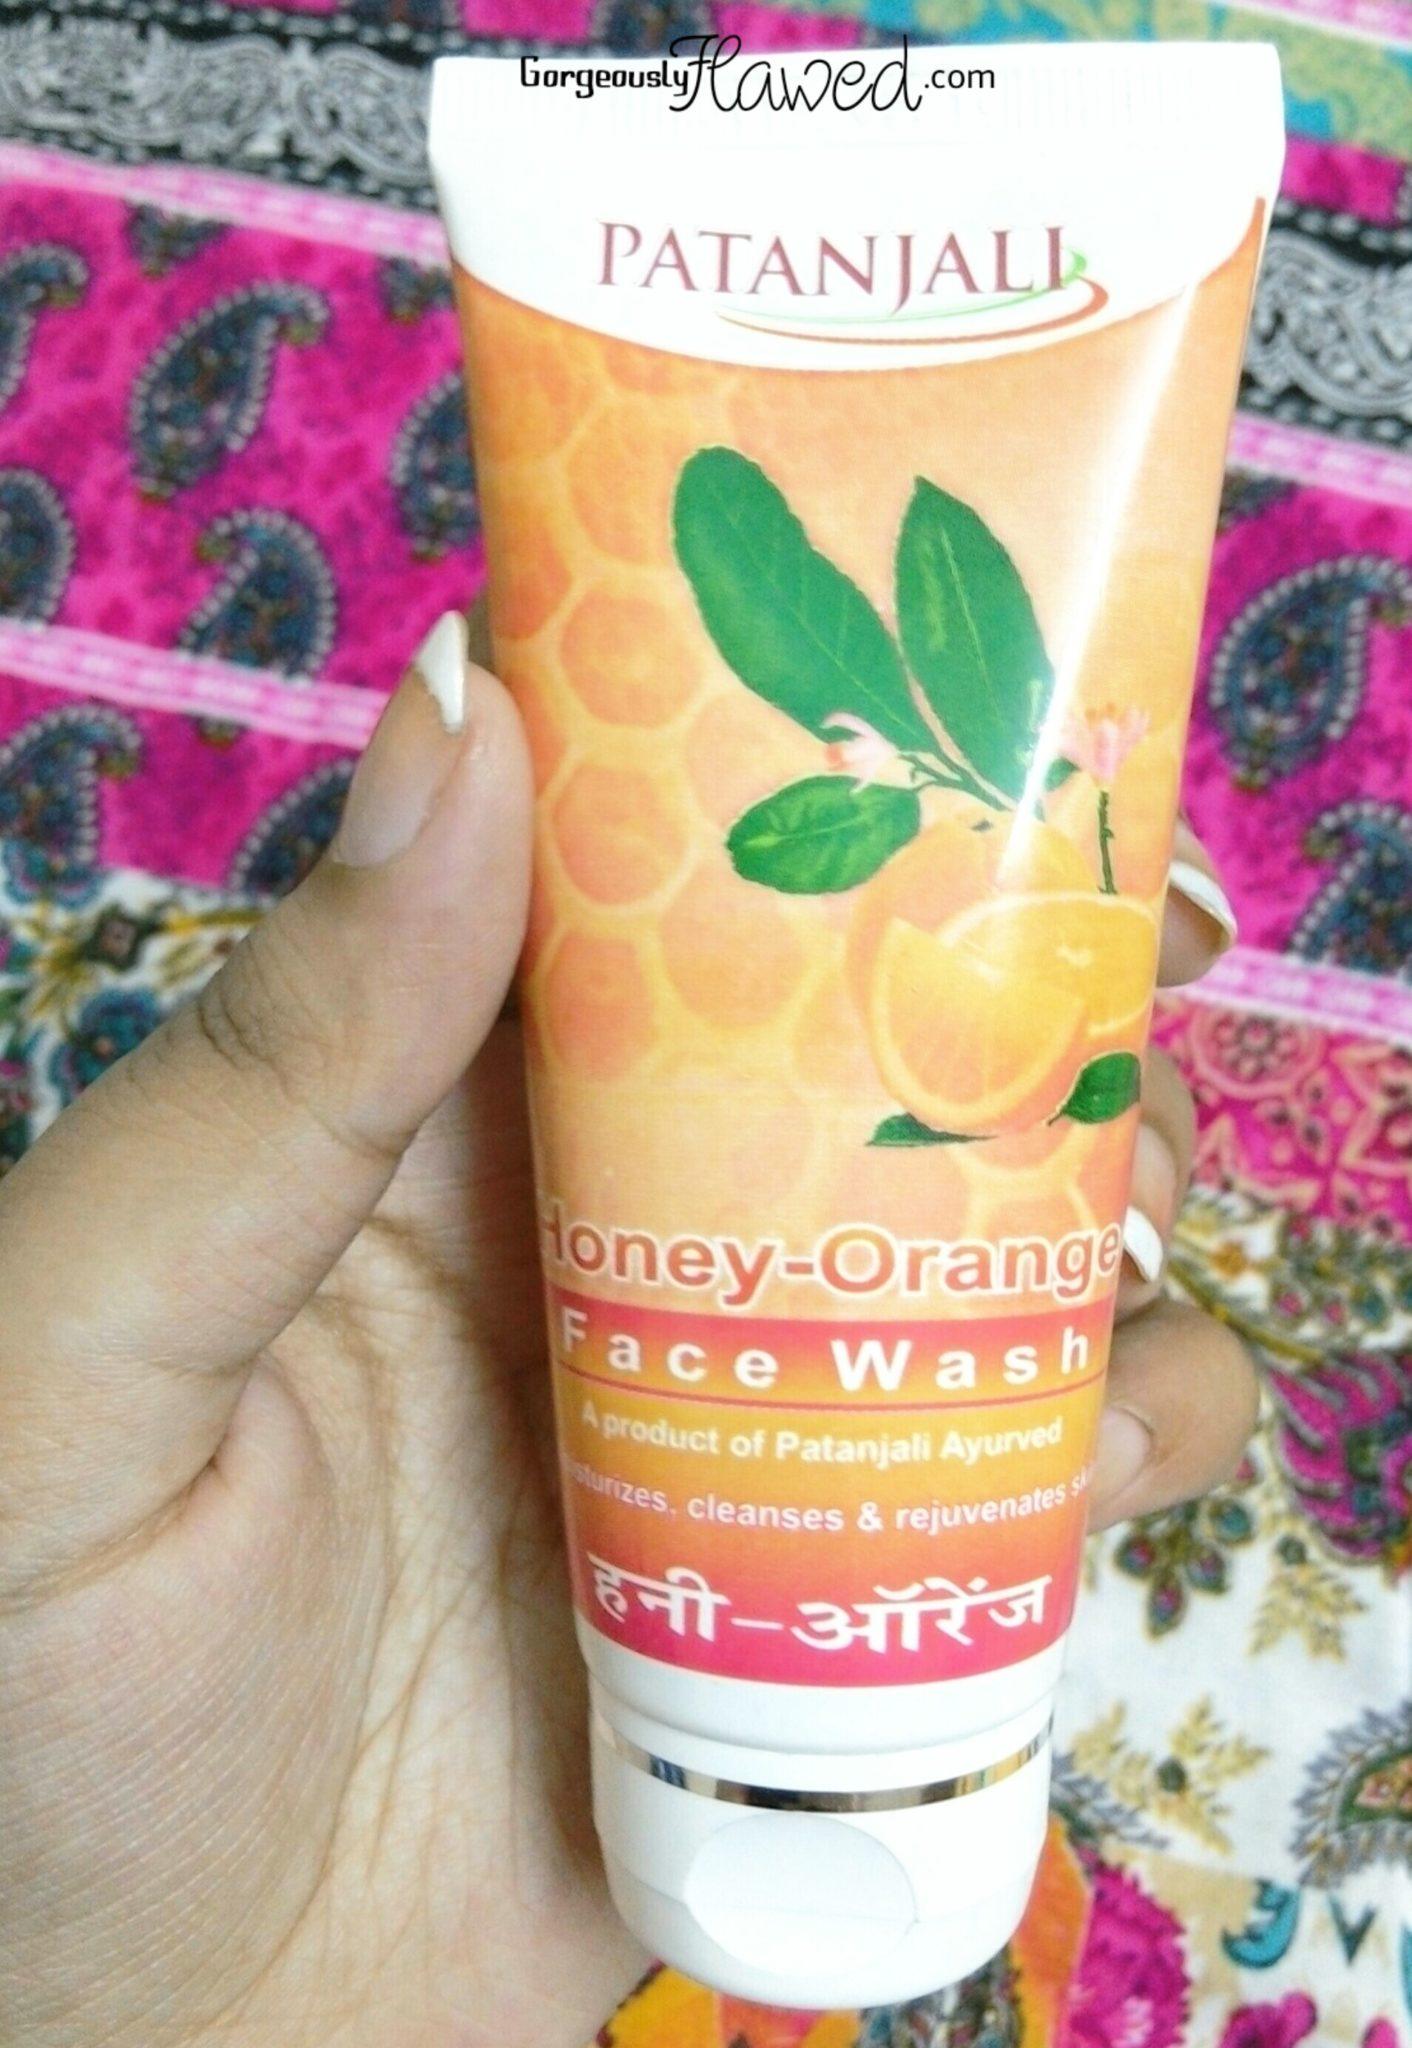 Patanjali Honey Orange Face Wash